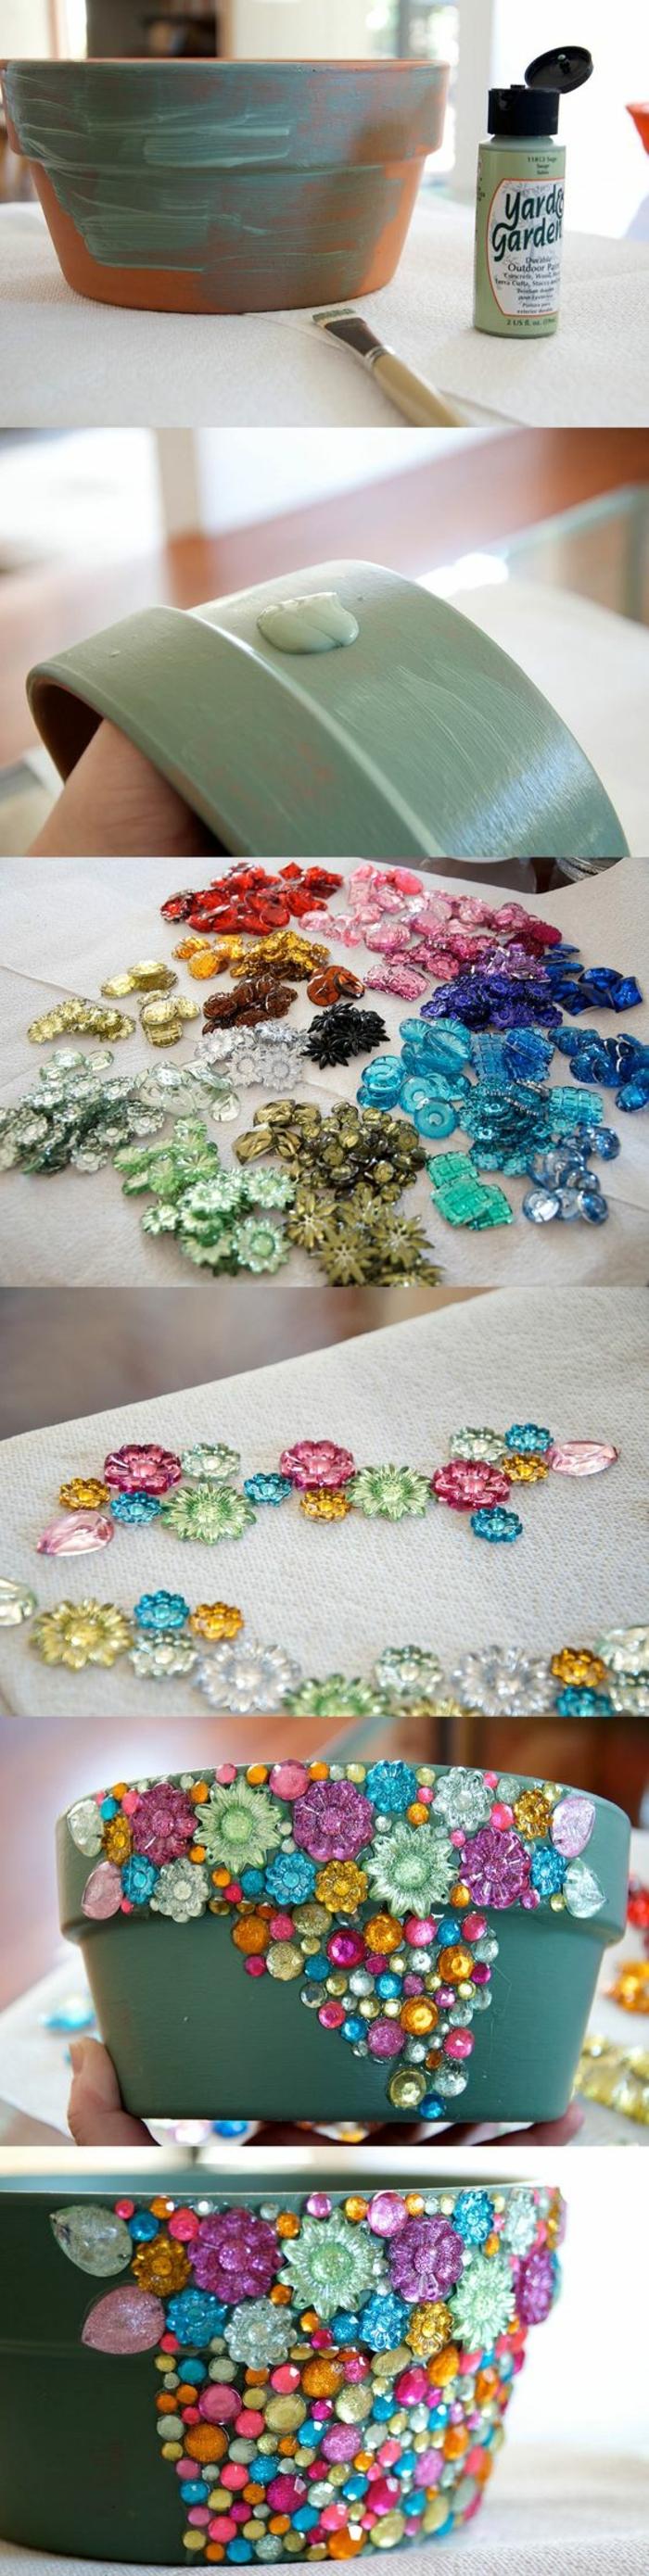 idee jardin, projet diy, perles en plastique, fleurs en plastique, pot à fleur céramique DIY, peinture acrylique imperméable